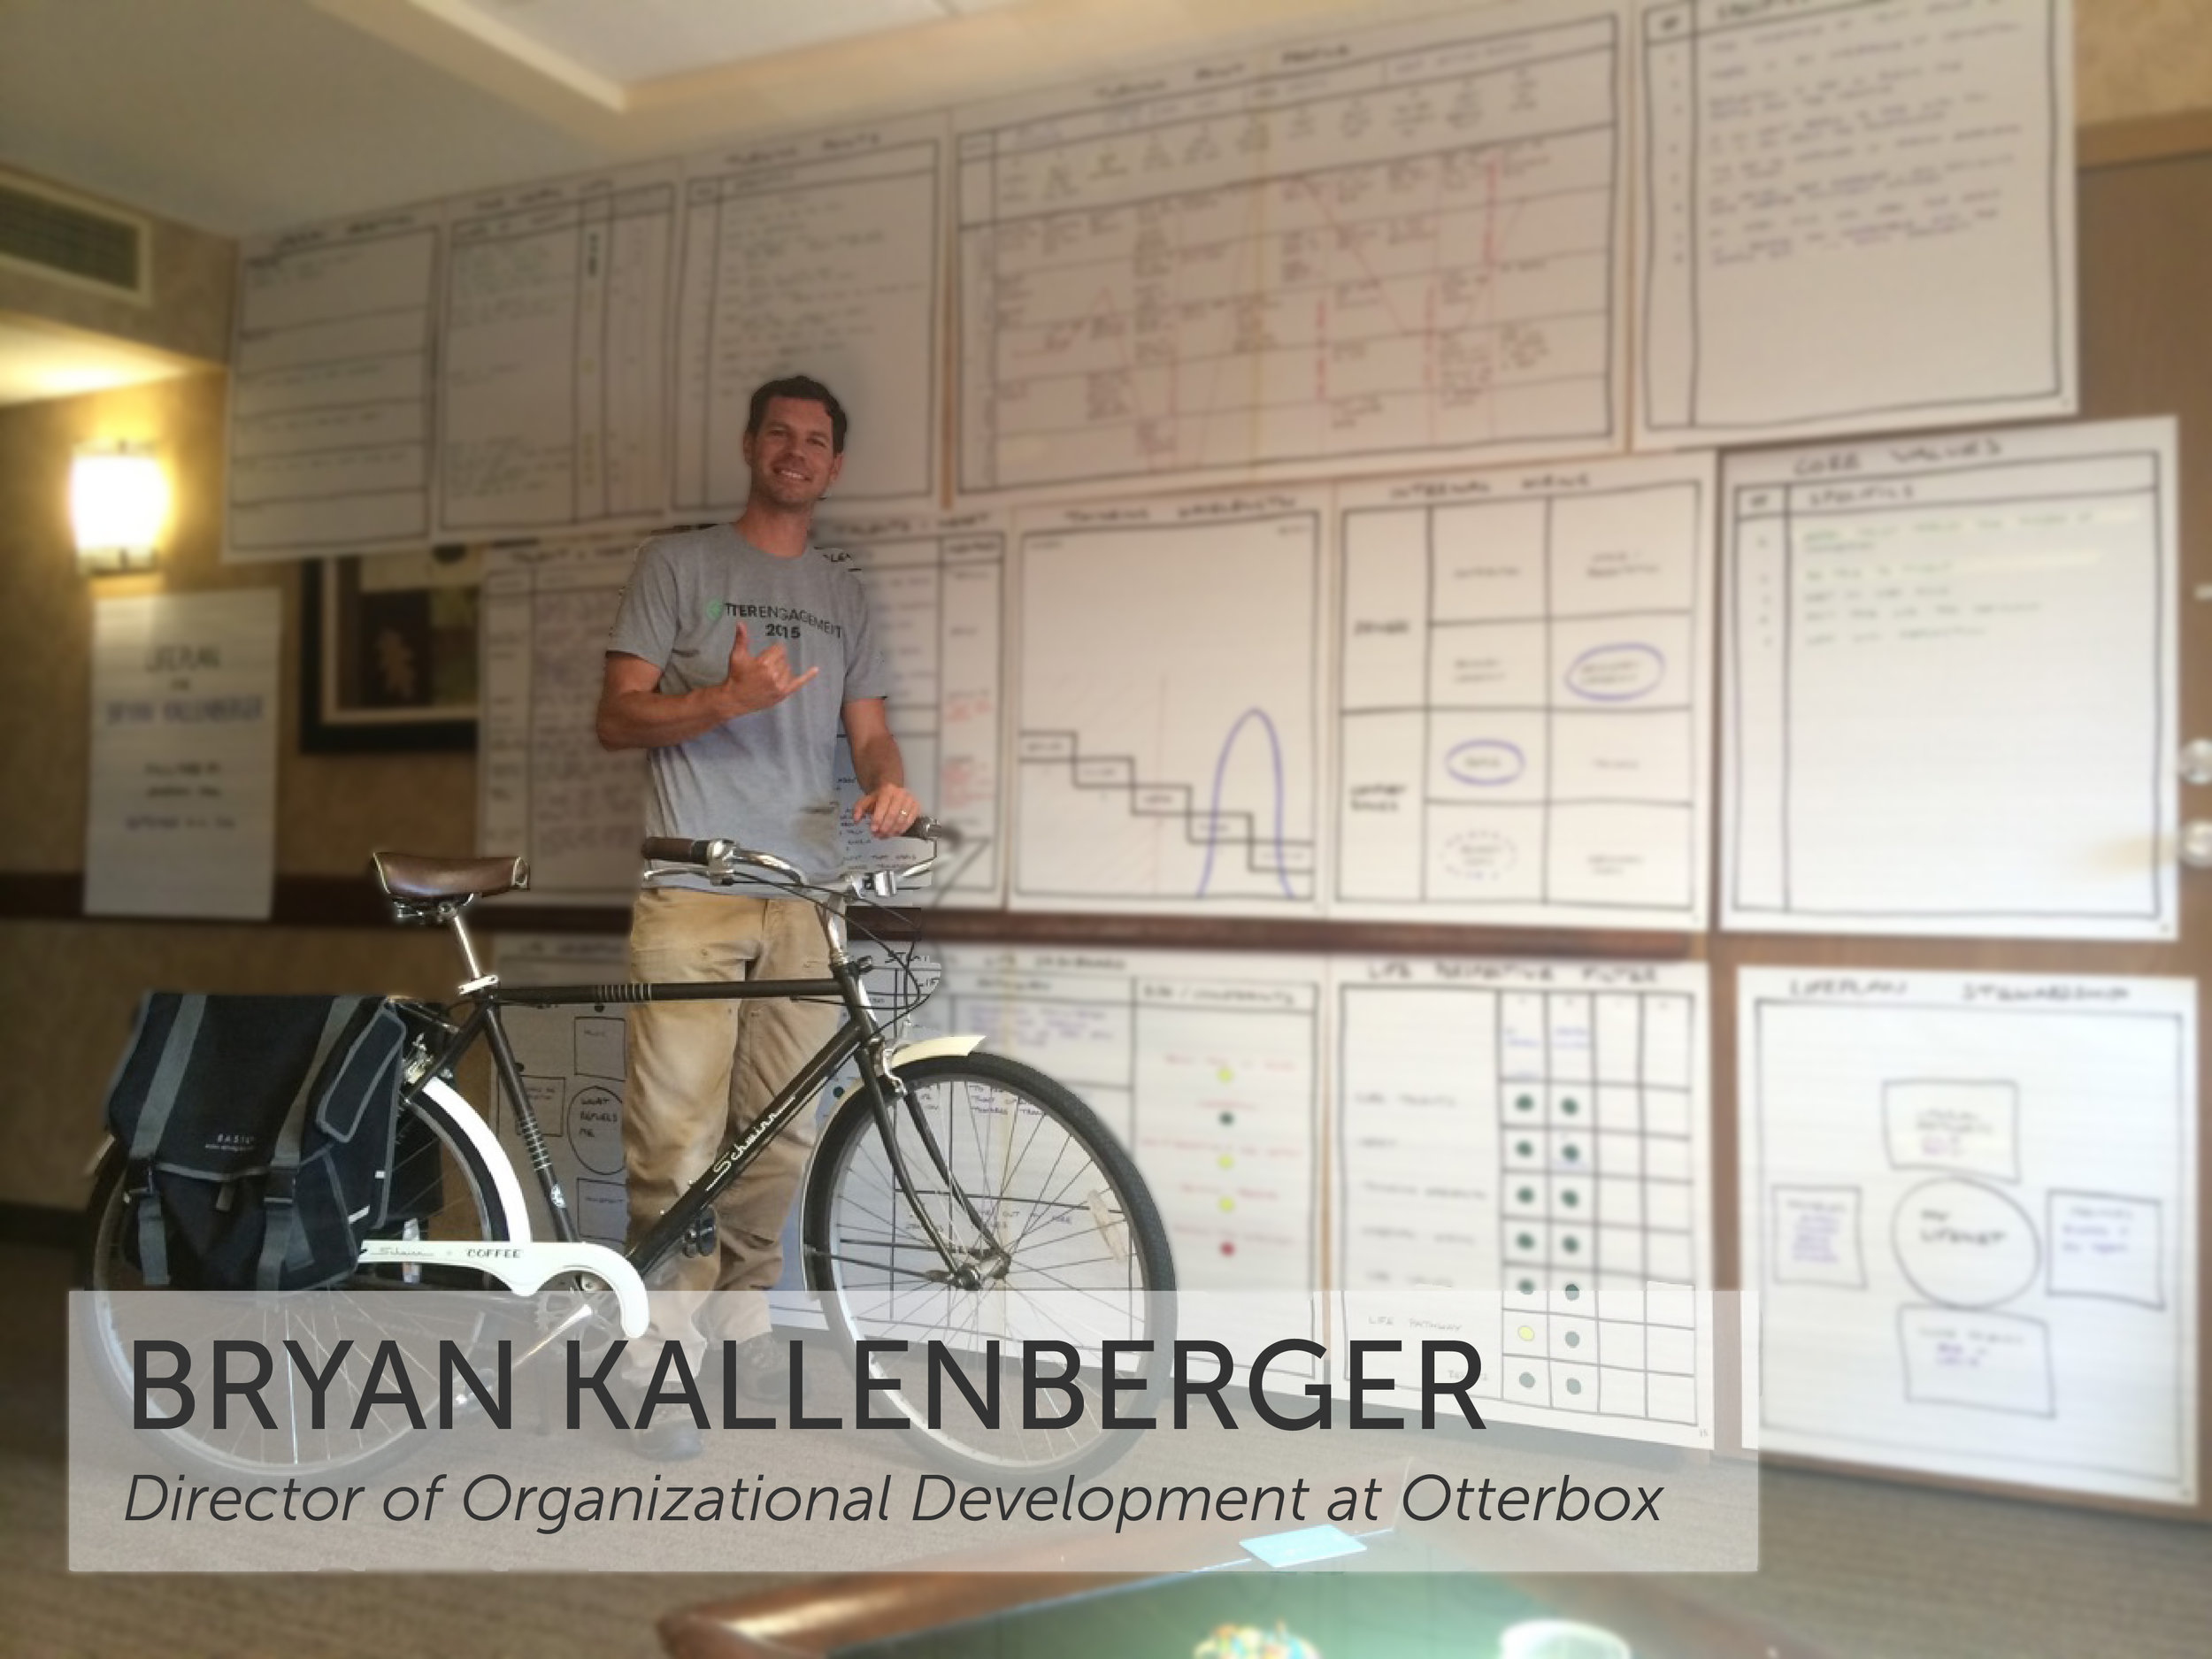 Bryan Kallenberger with name.jpg